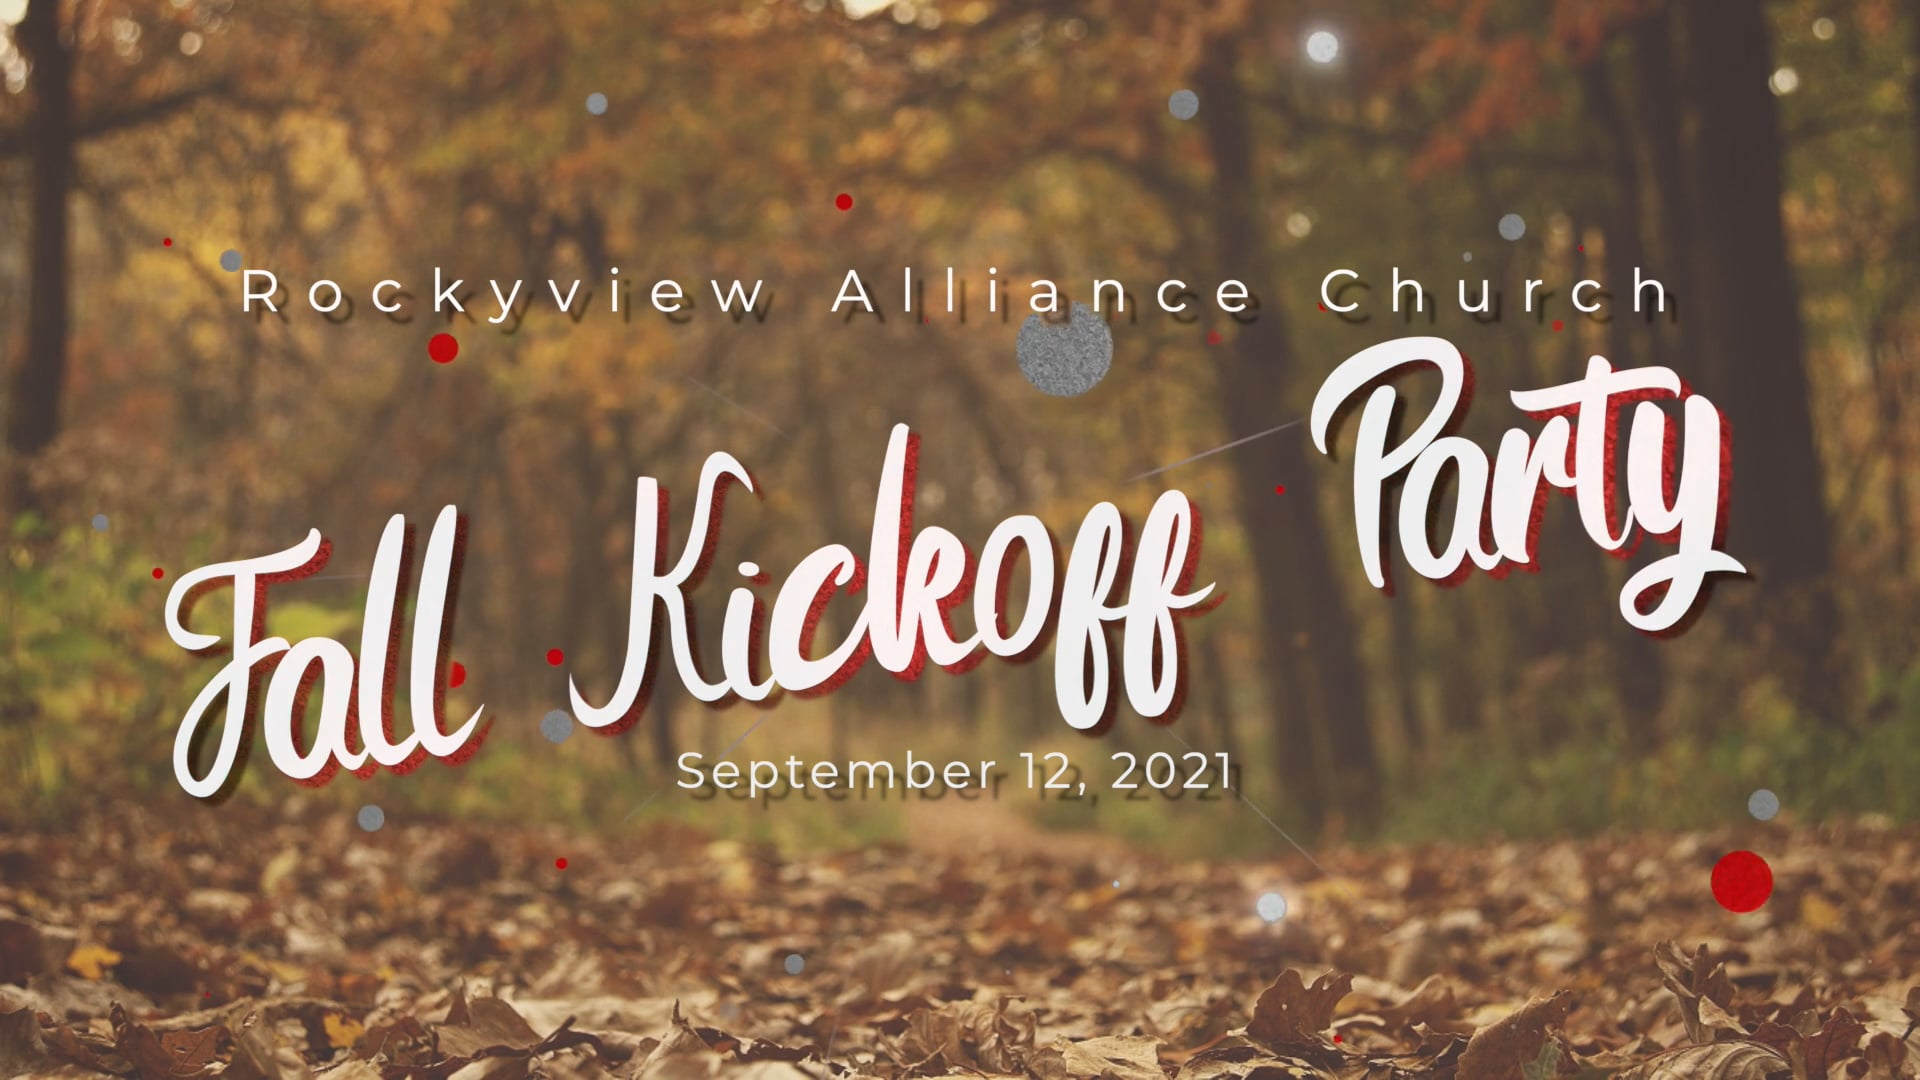 Rockyview Fall Kickoff 2021 - RECAP